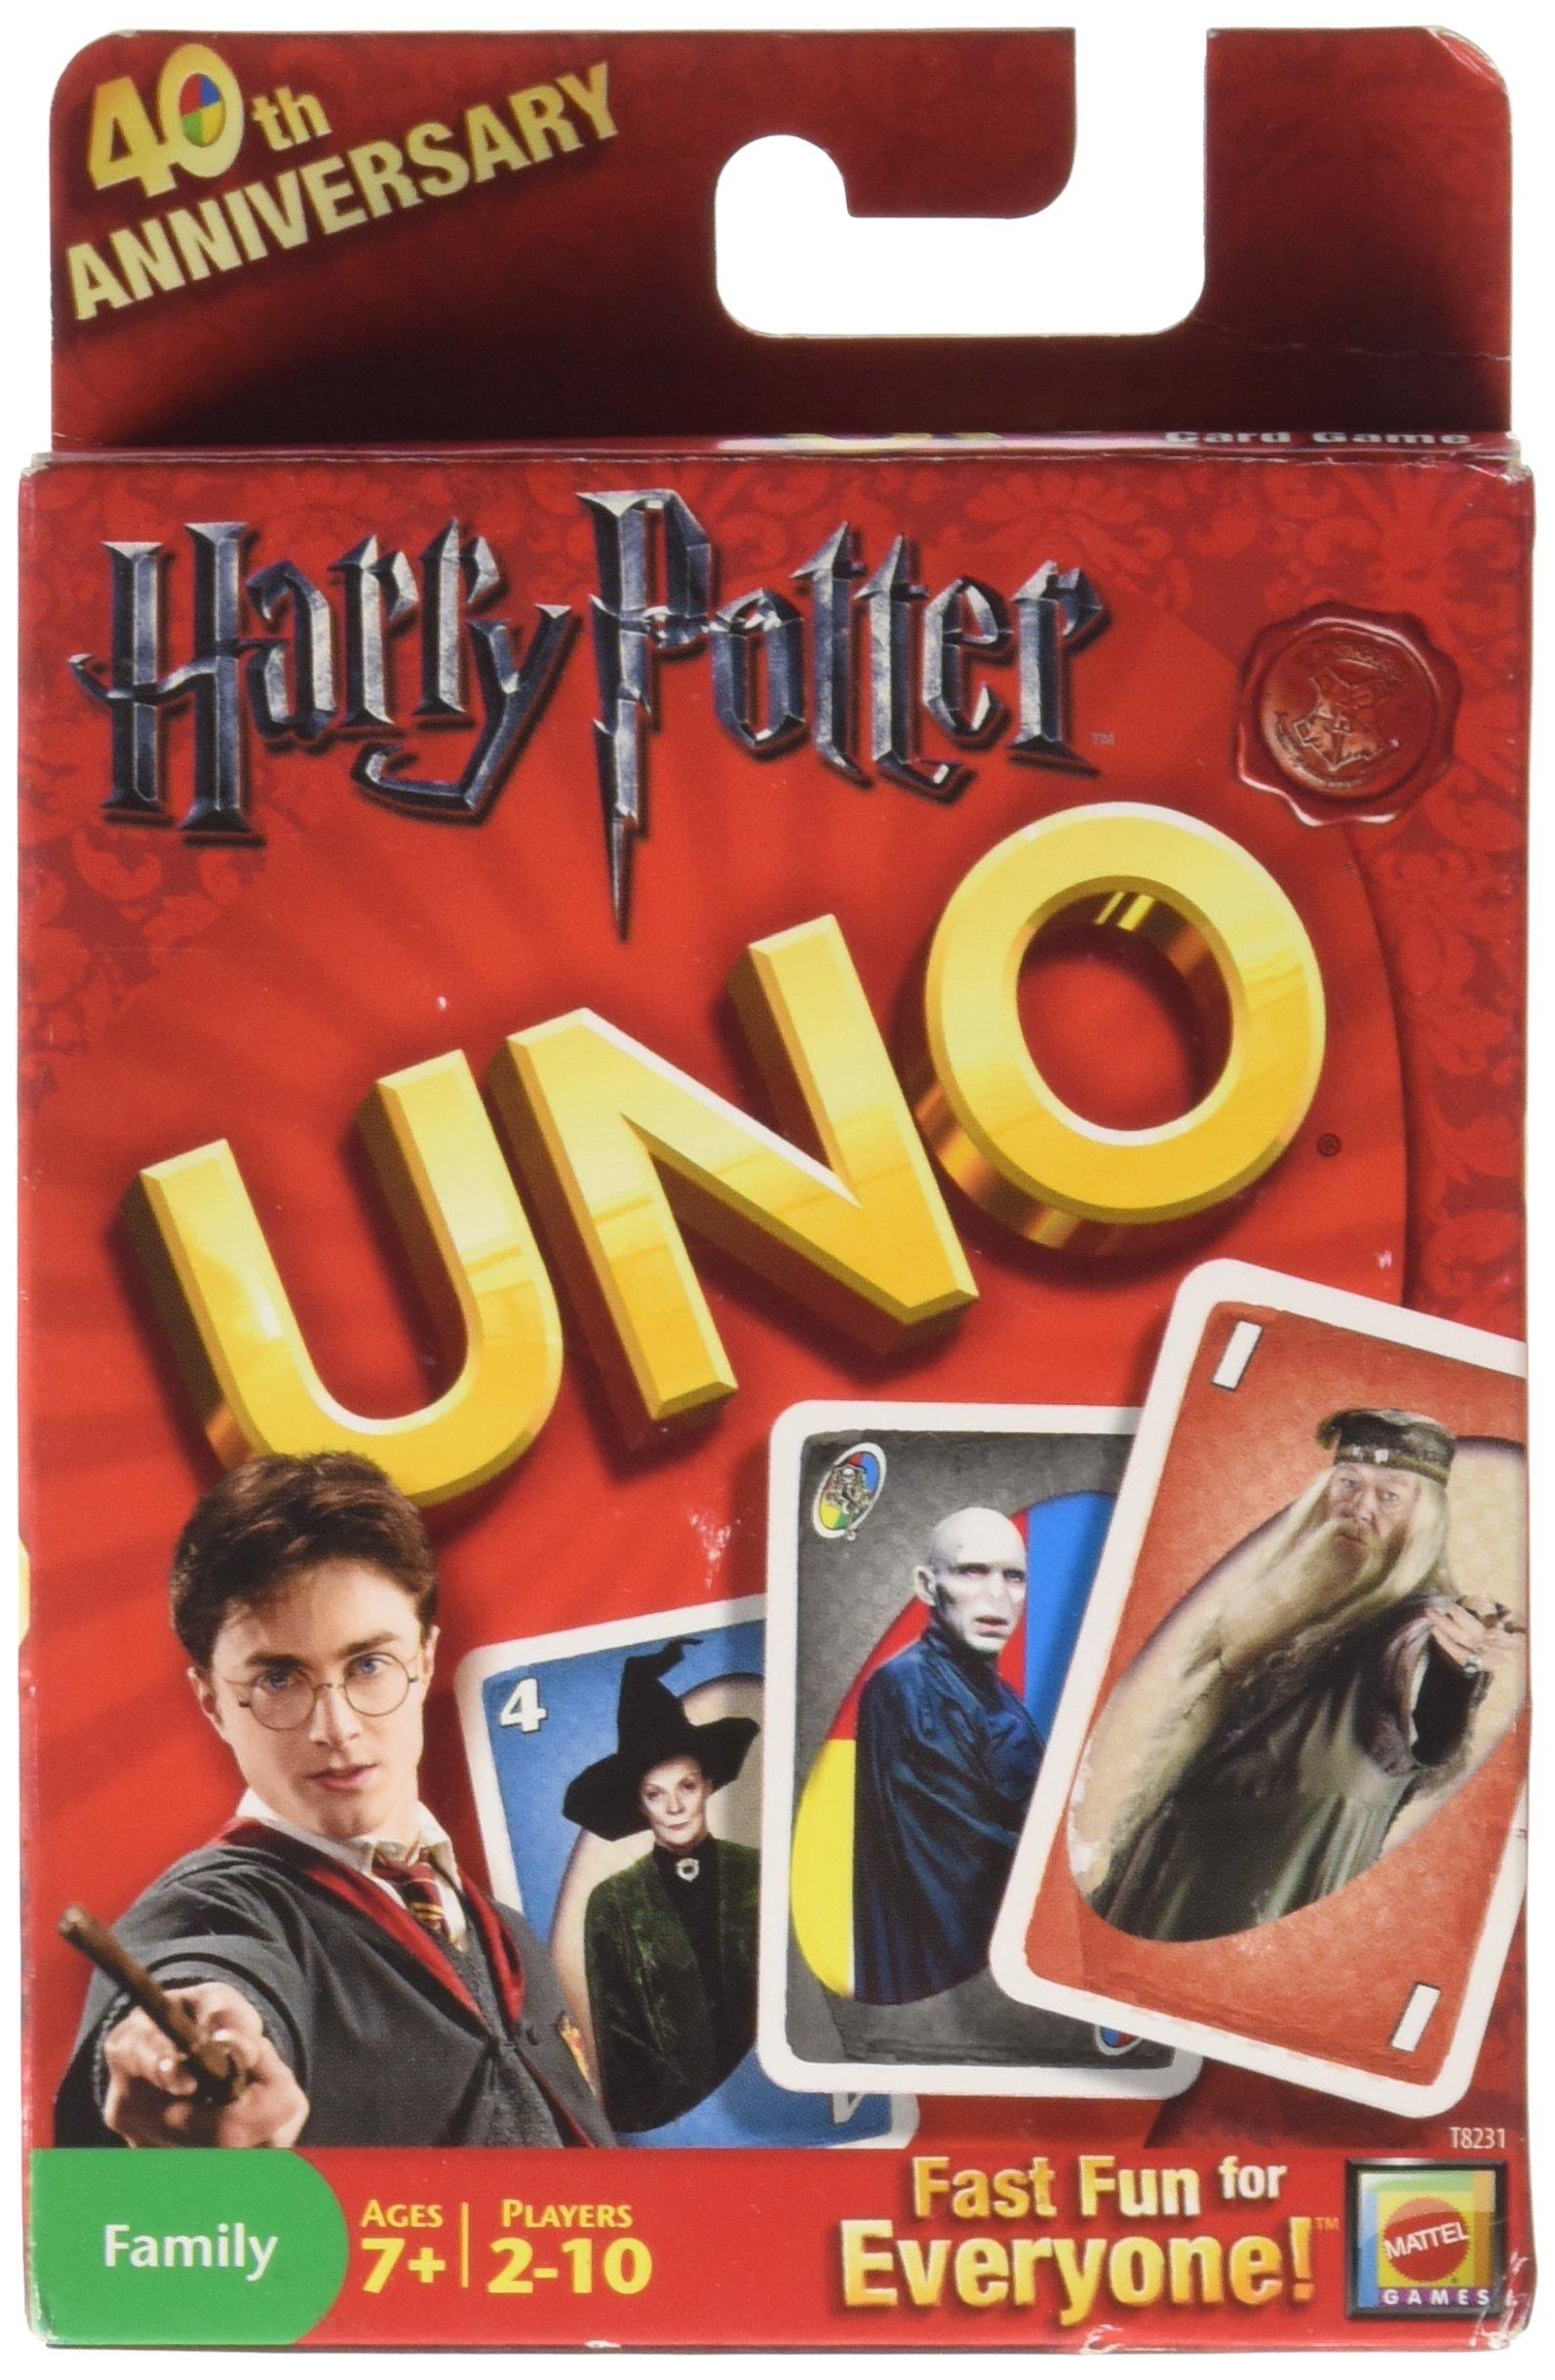 Mattel Harry Potter Uno Card Game - Mattel T8231 by Mattel